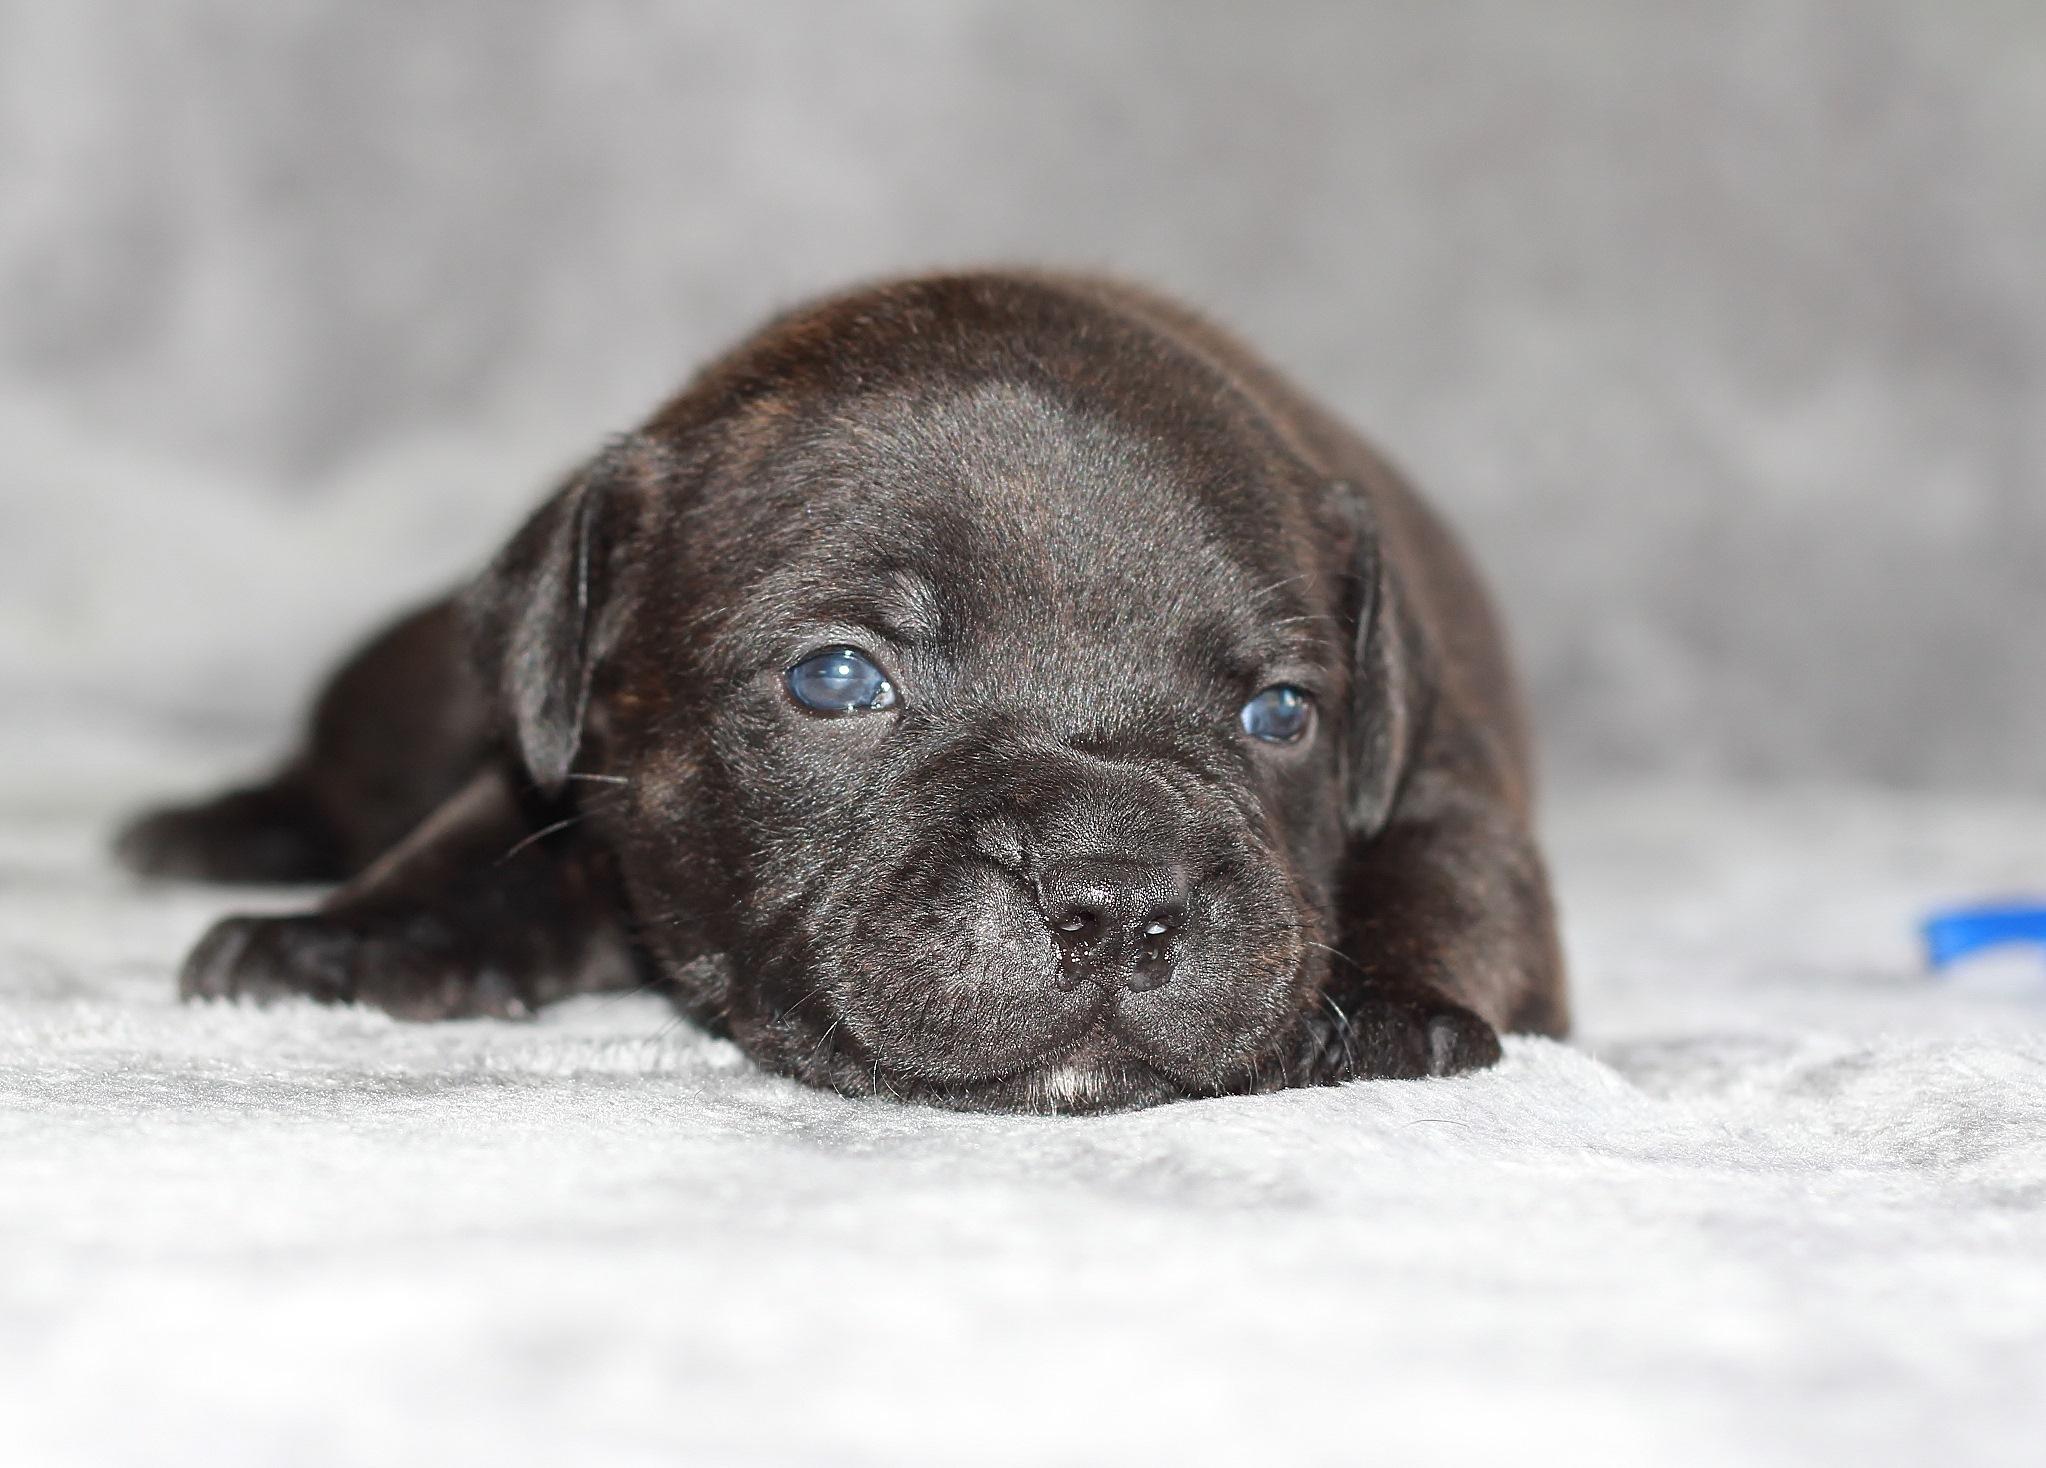 blue boy 21 days old